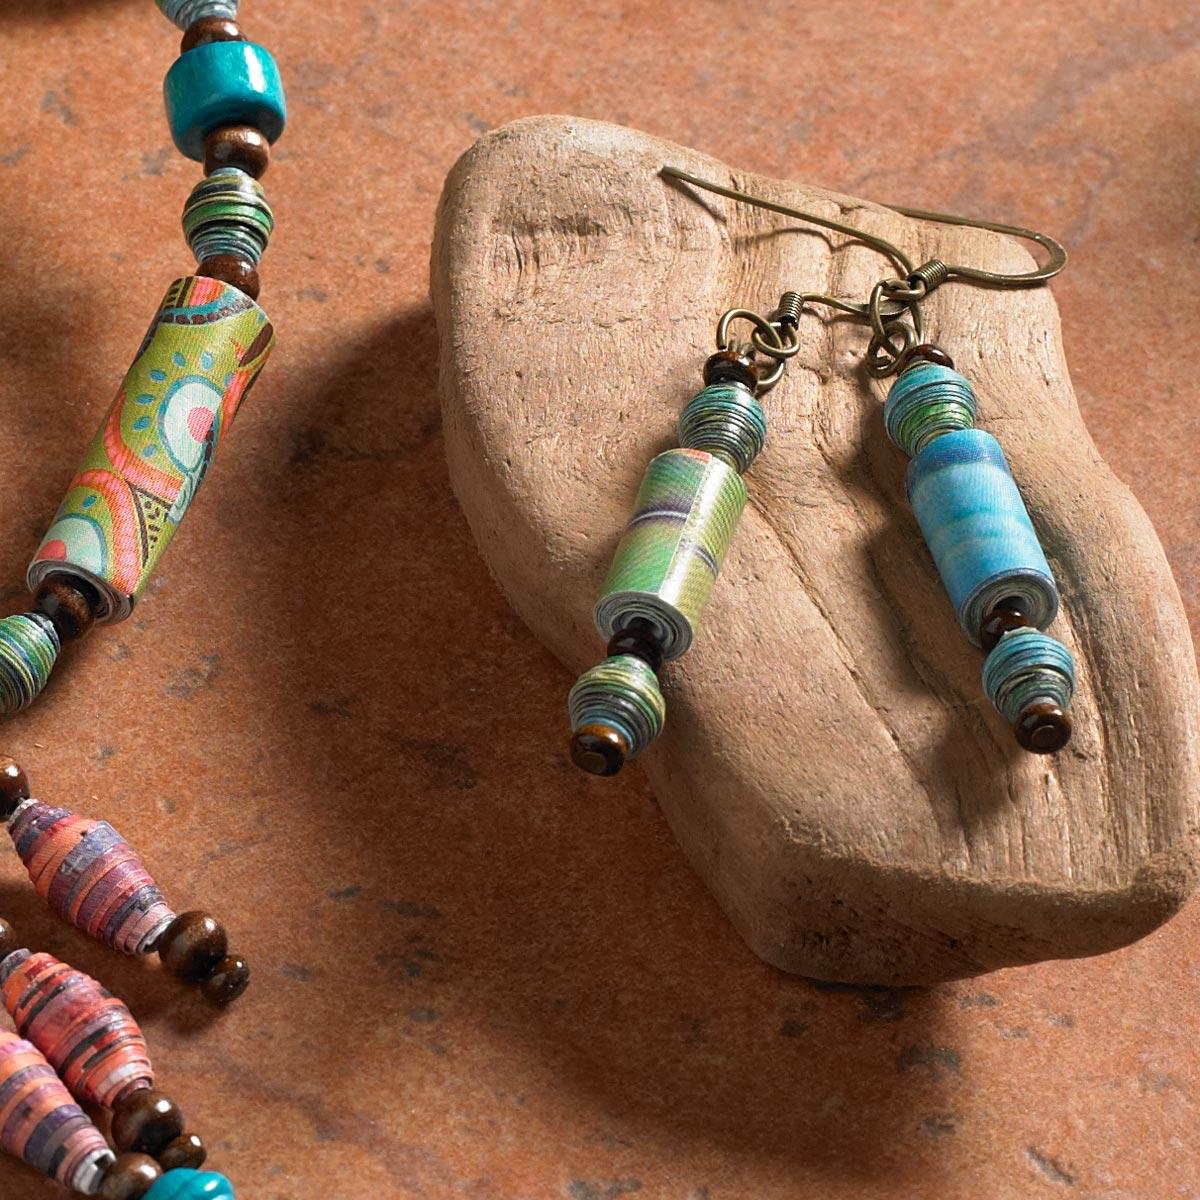 Mod Podge DIY Jewelry Project Idea